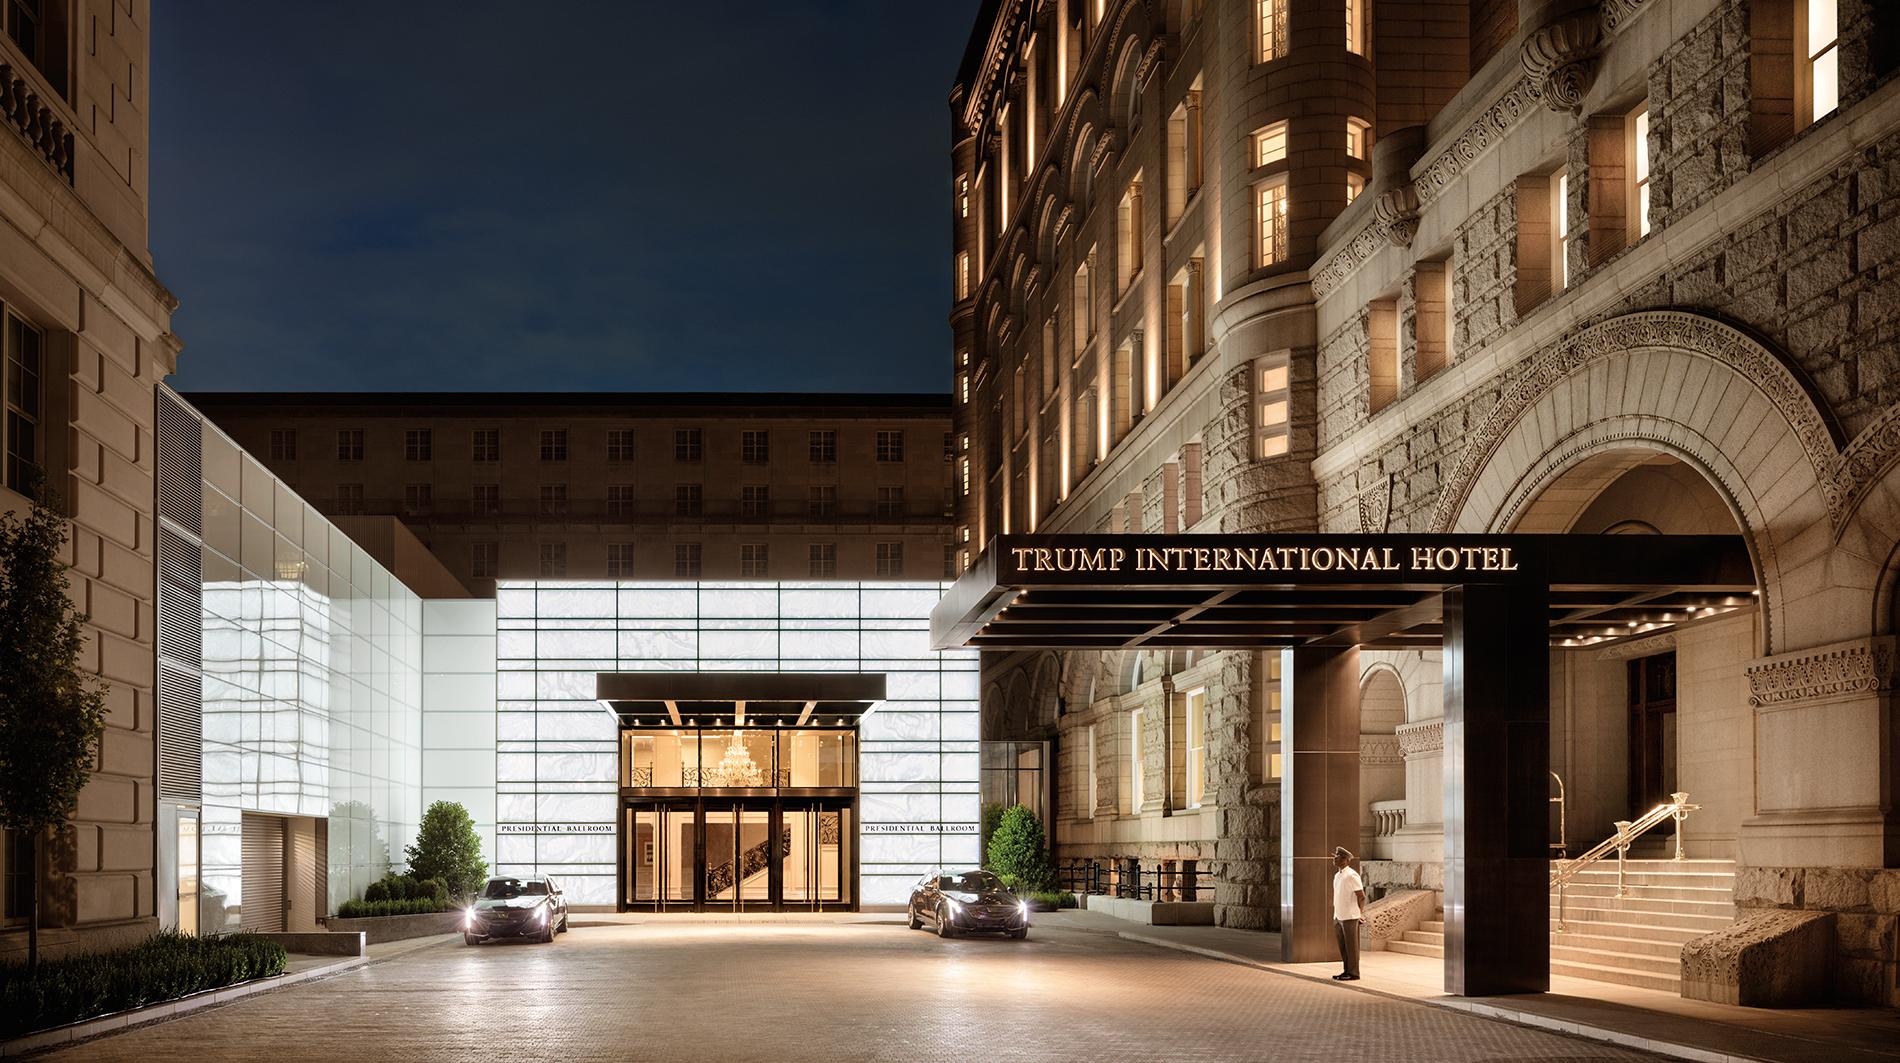 Trump international hotel washington dc Benjamin main entrance